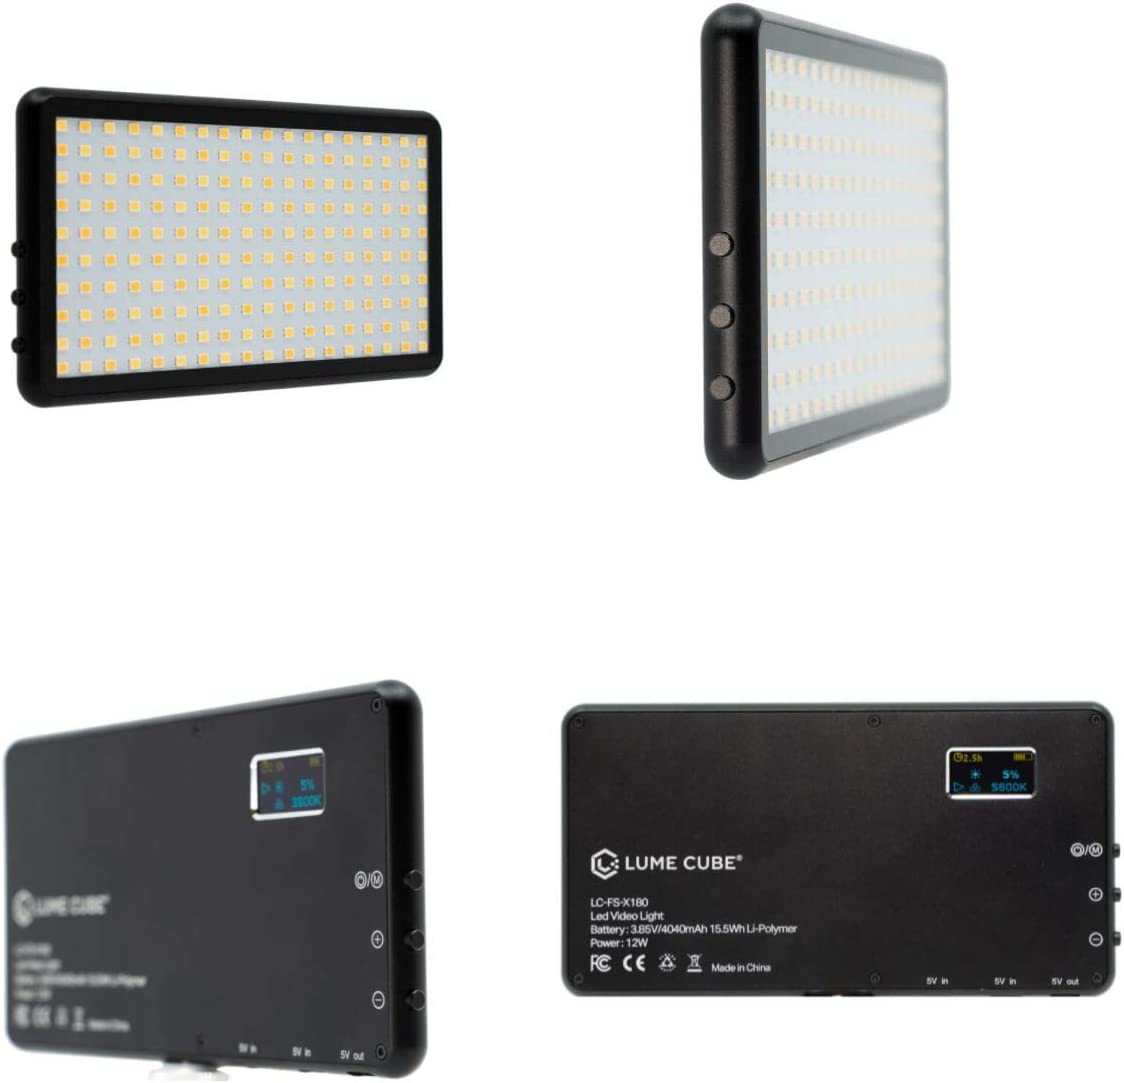 Lume Cube Panel Zweifarbige Led Power Bank Für Foto Kamera